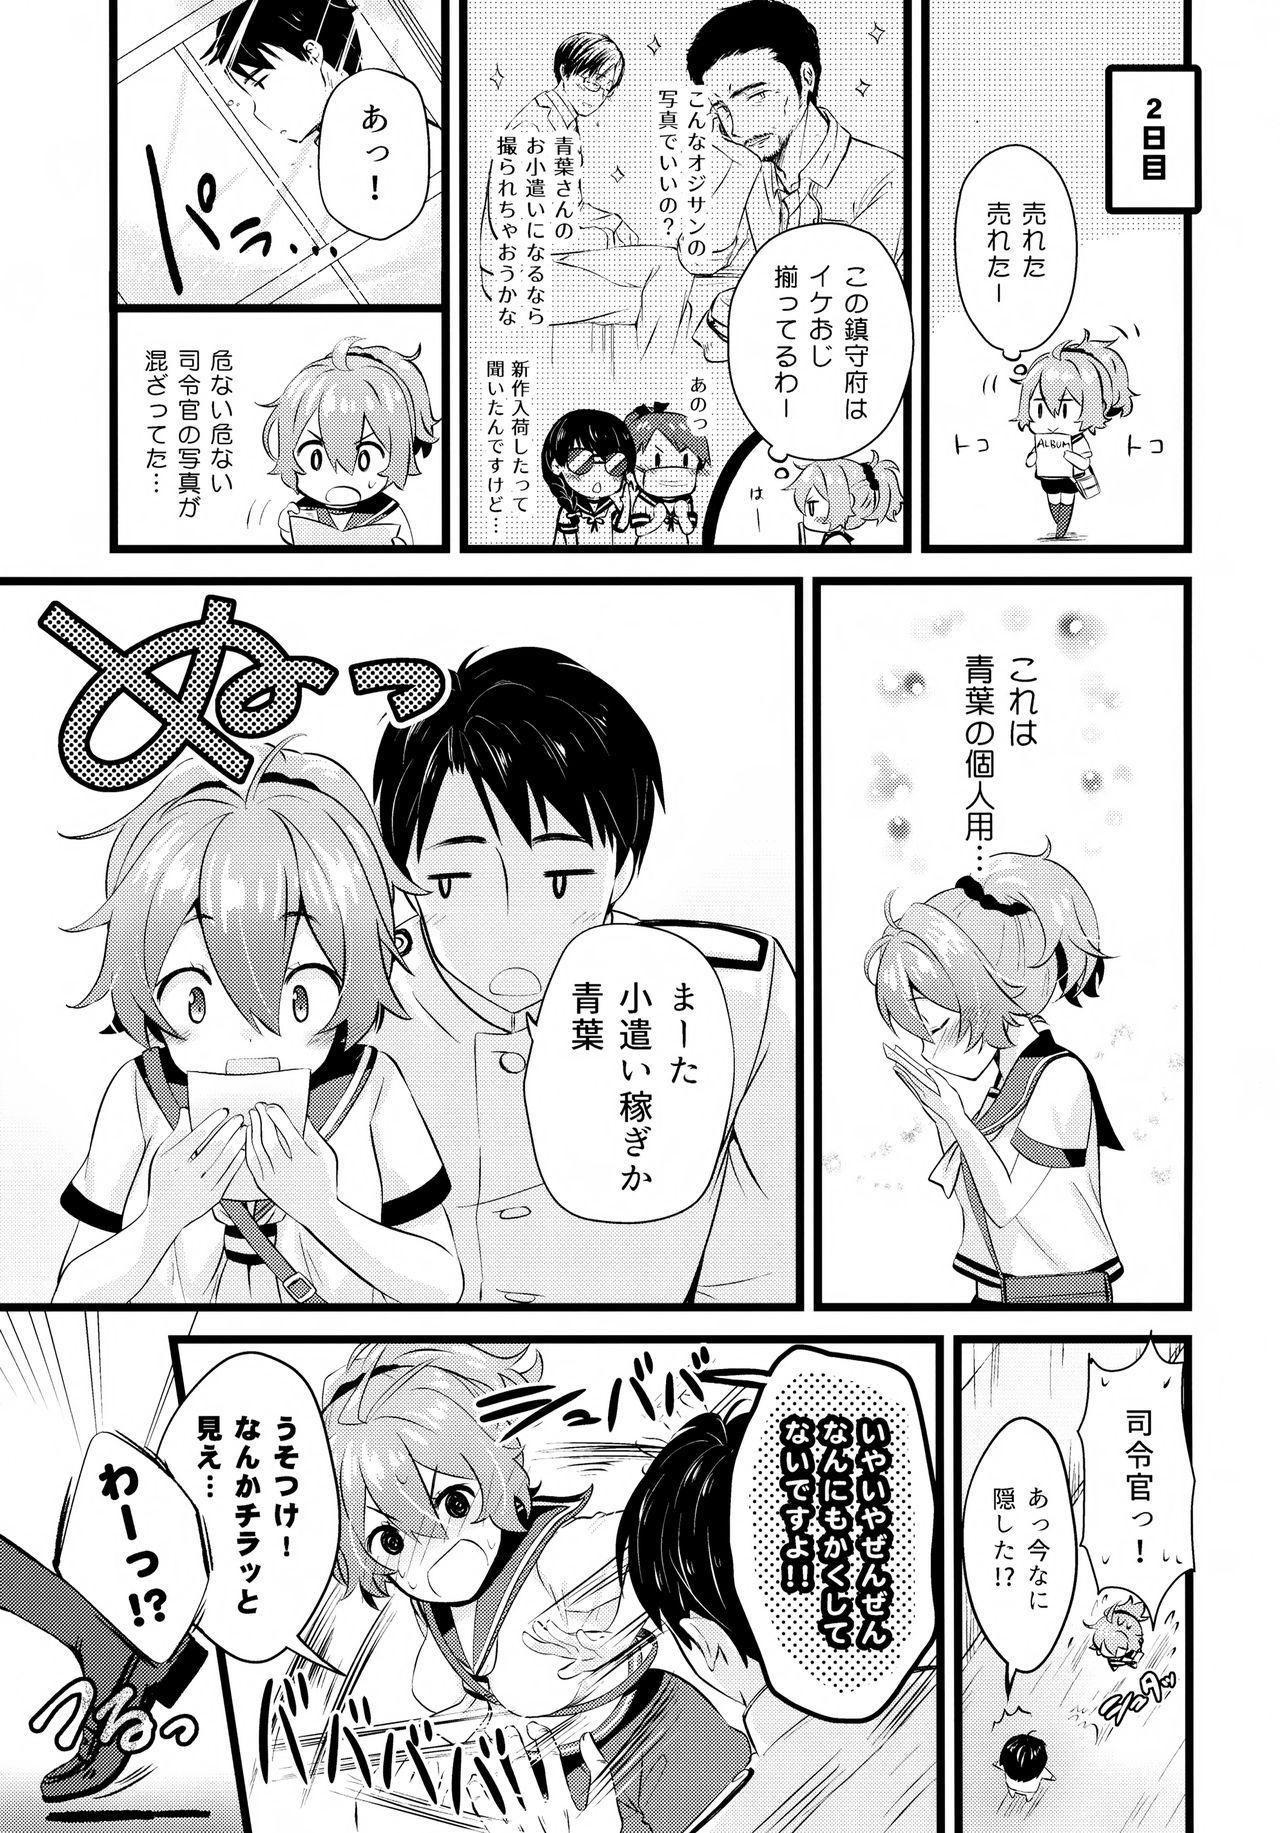 Aoba Ecchi na Happening Shuzai Shimaasu 3